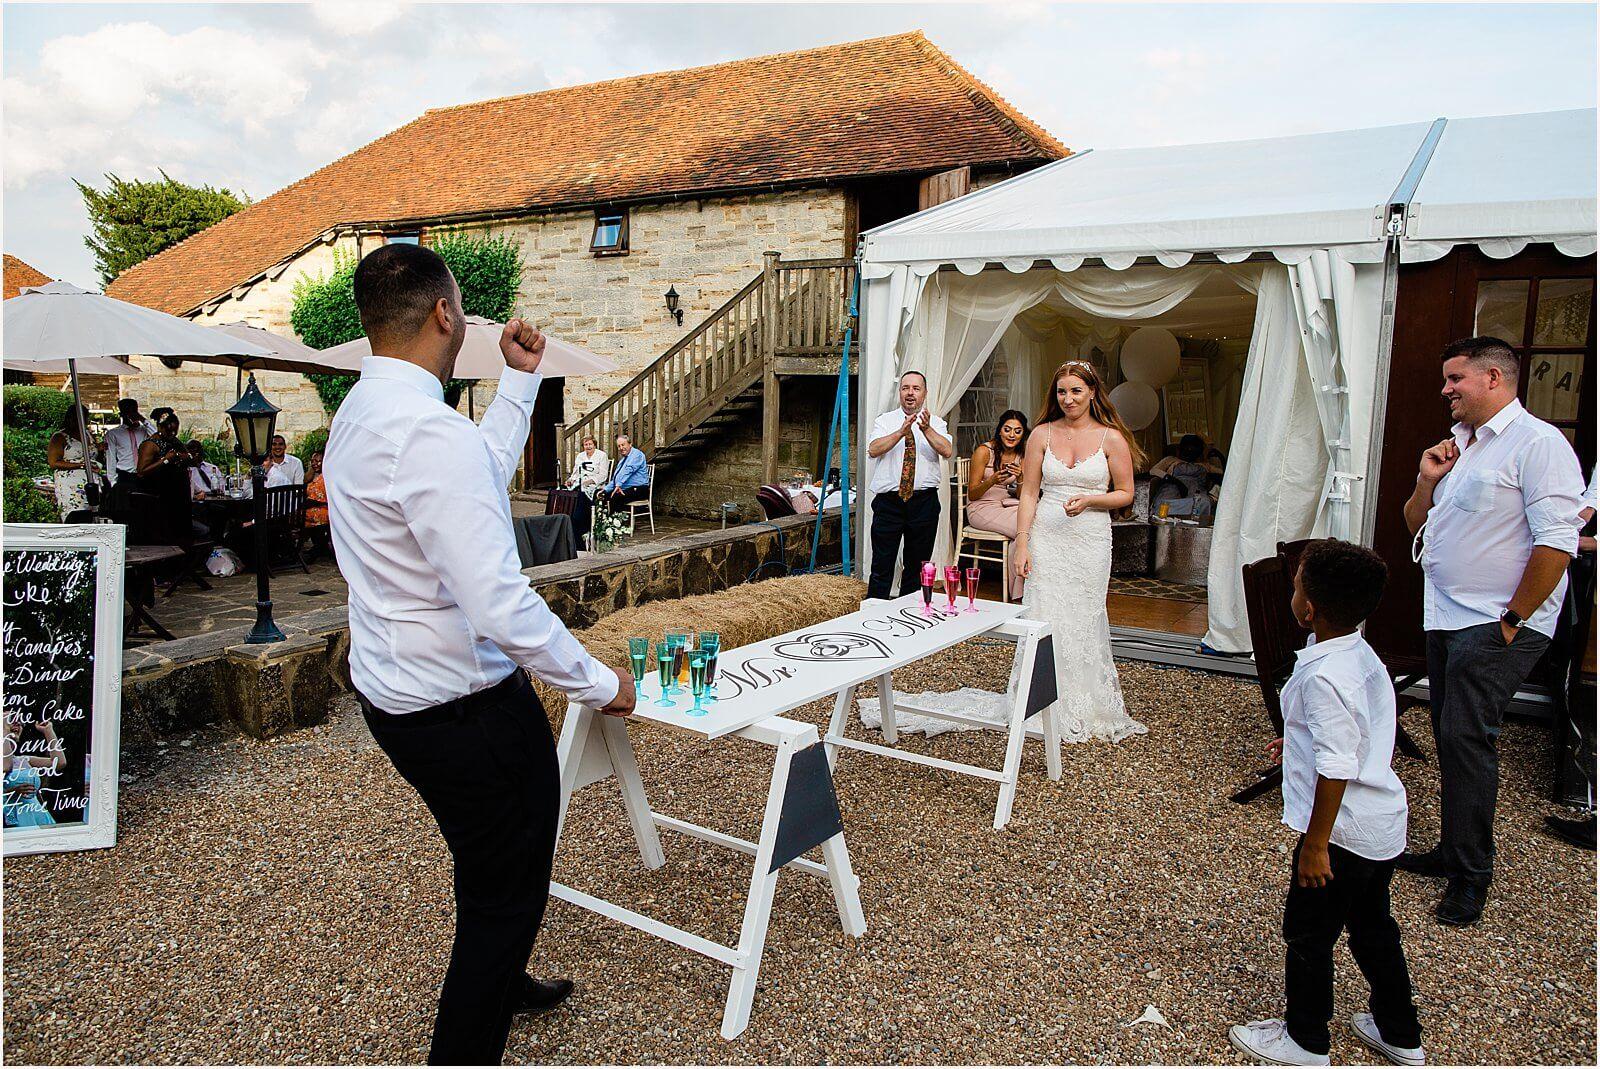 Swallows Oast Wedding - Jakki + Luke's barn wedding photography 57